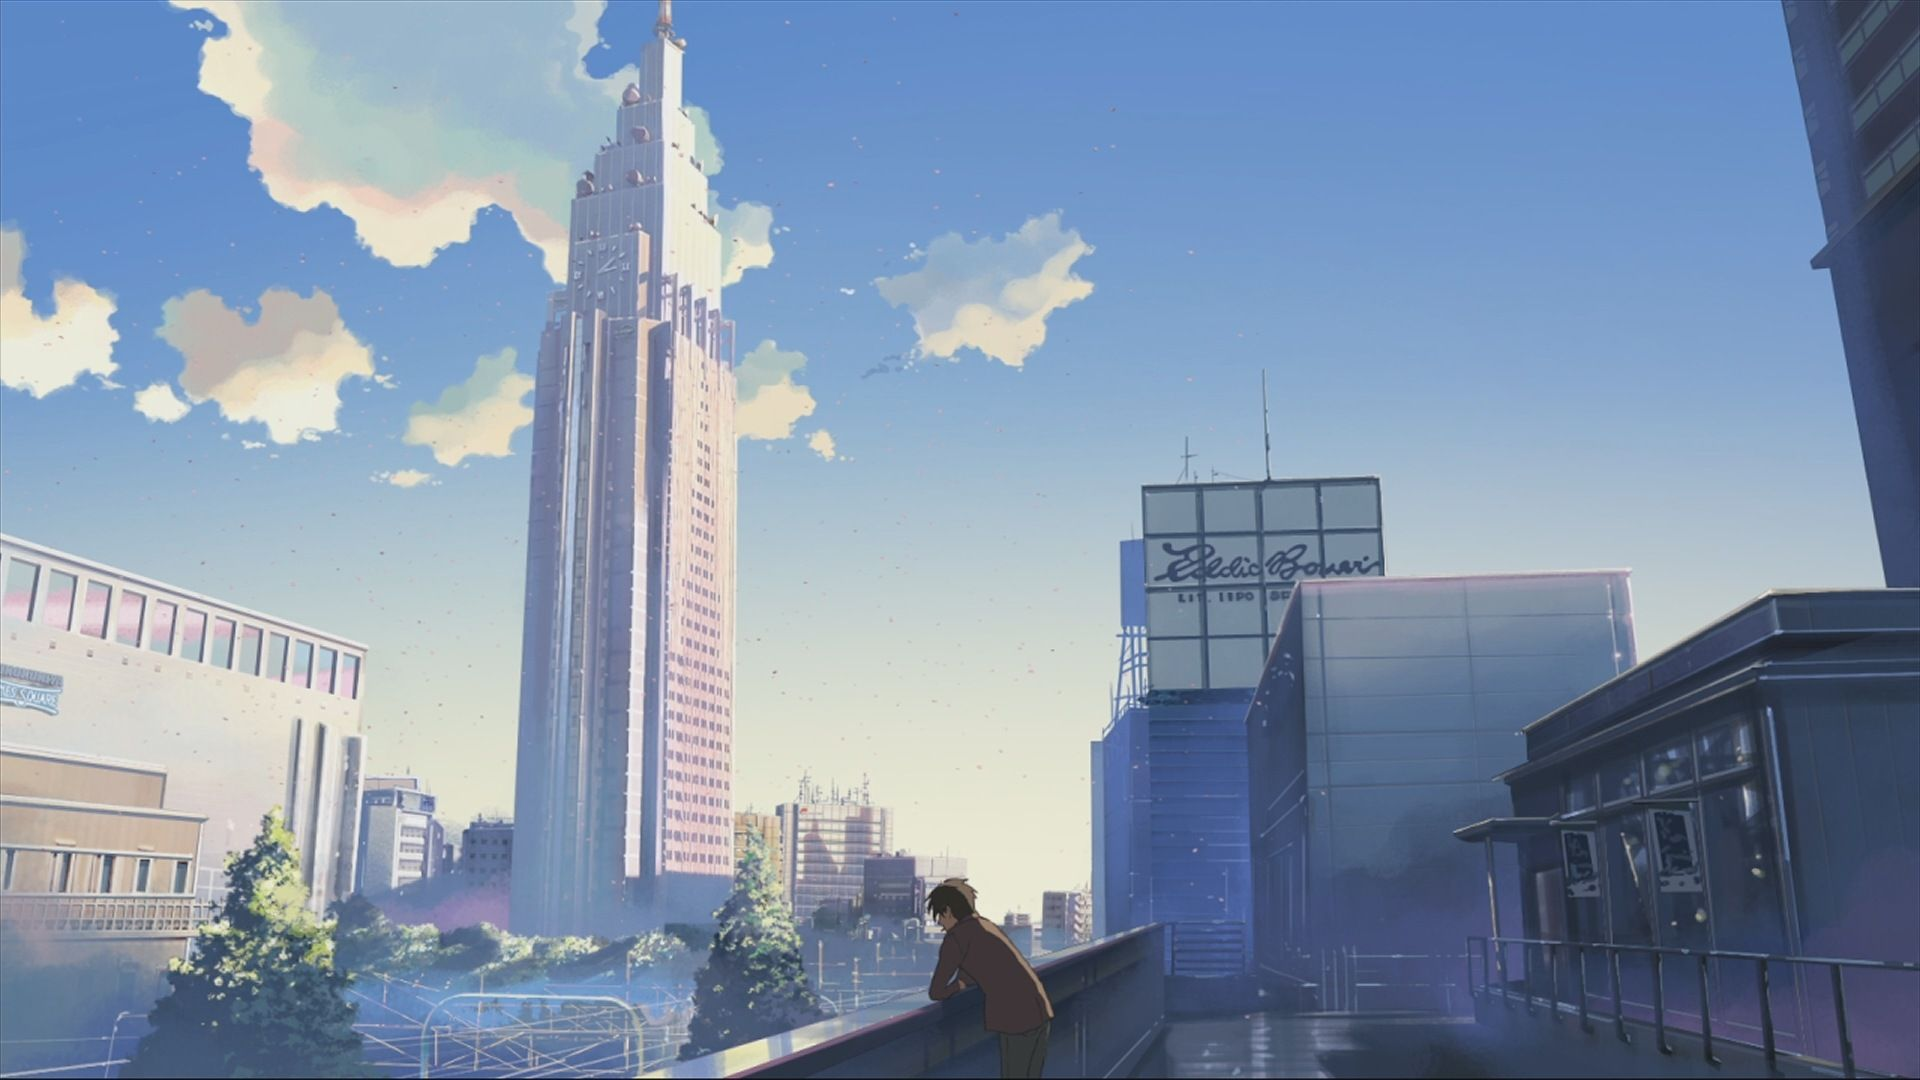 Low Detail City Aesthetic Anime Anime Scenery Anime Wallpaper 1920x1080